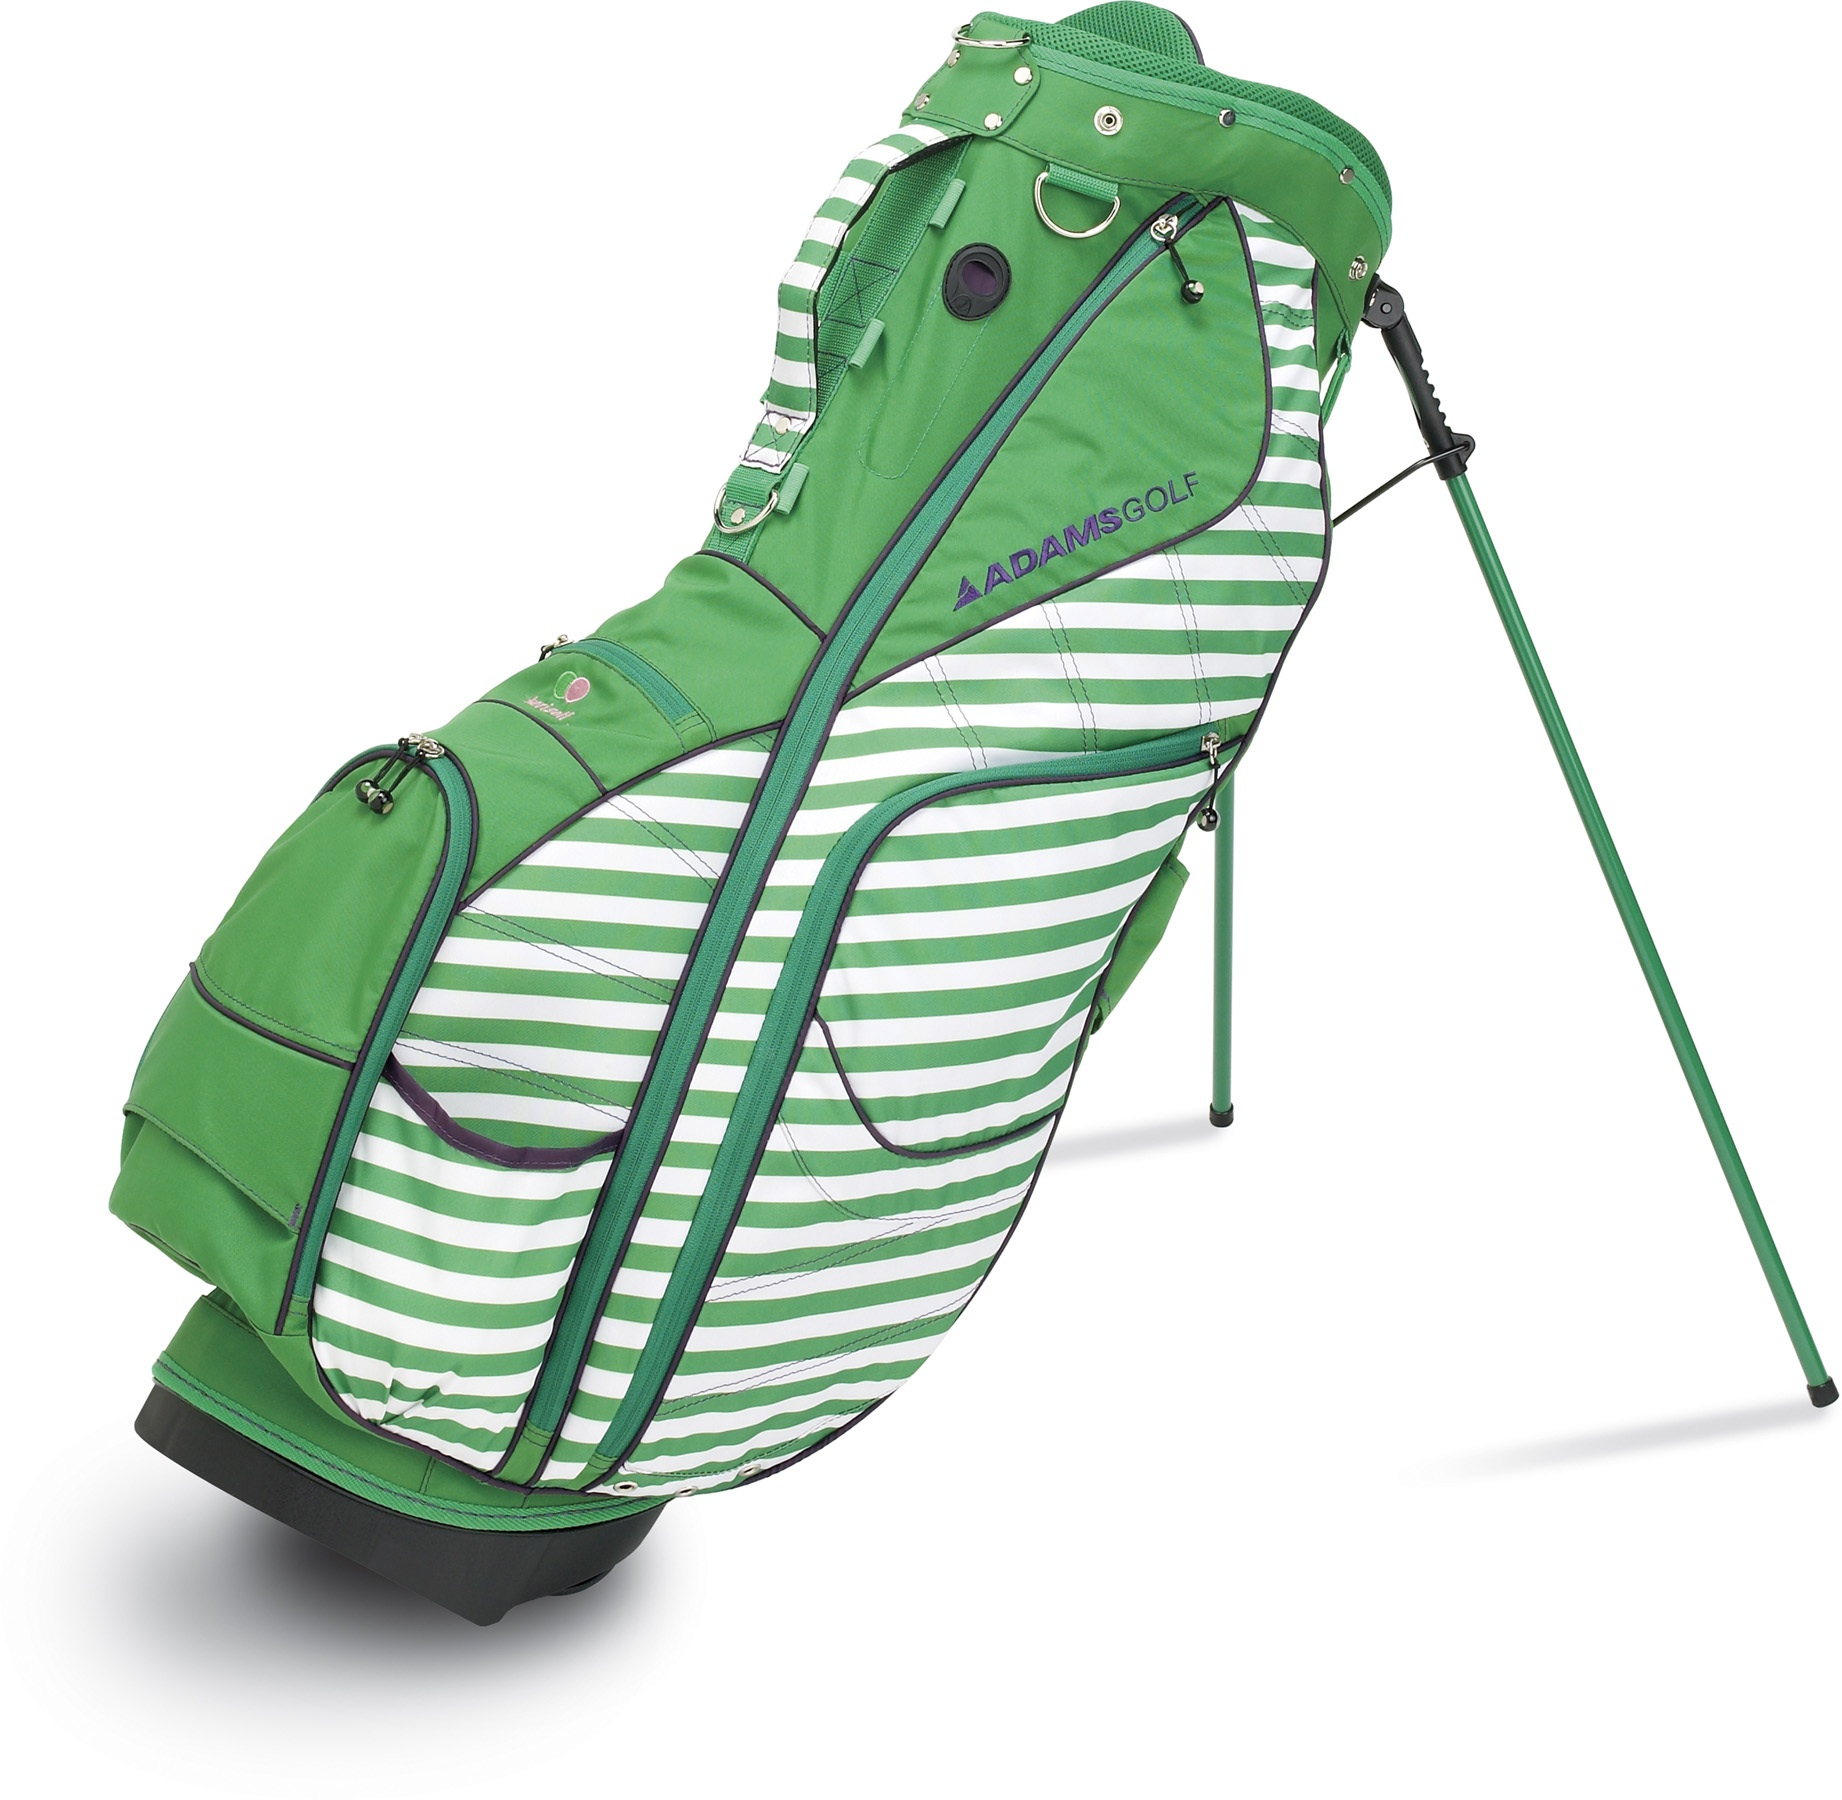 Keri sport fern stand bag in green.